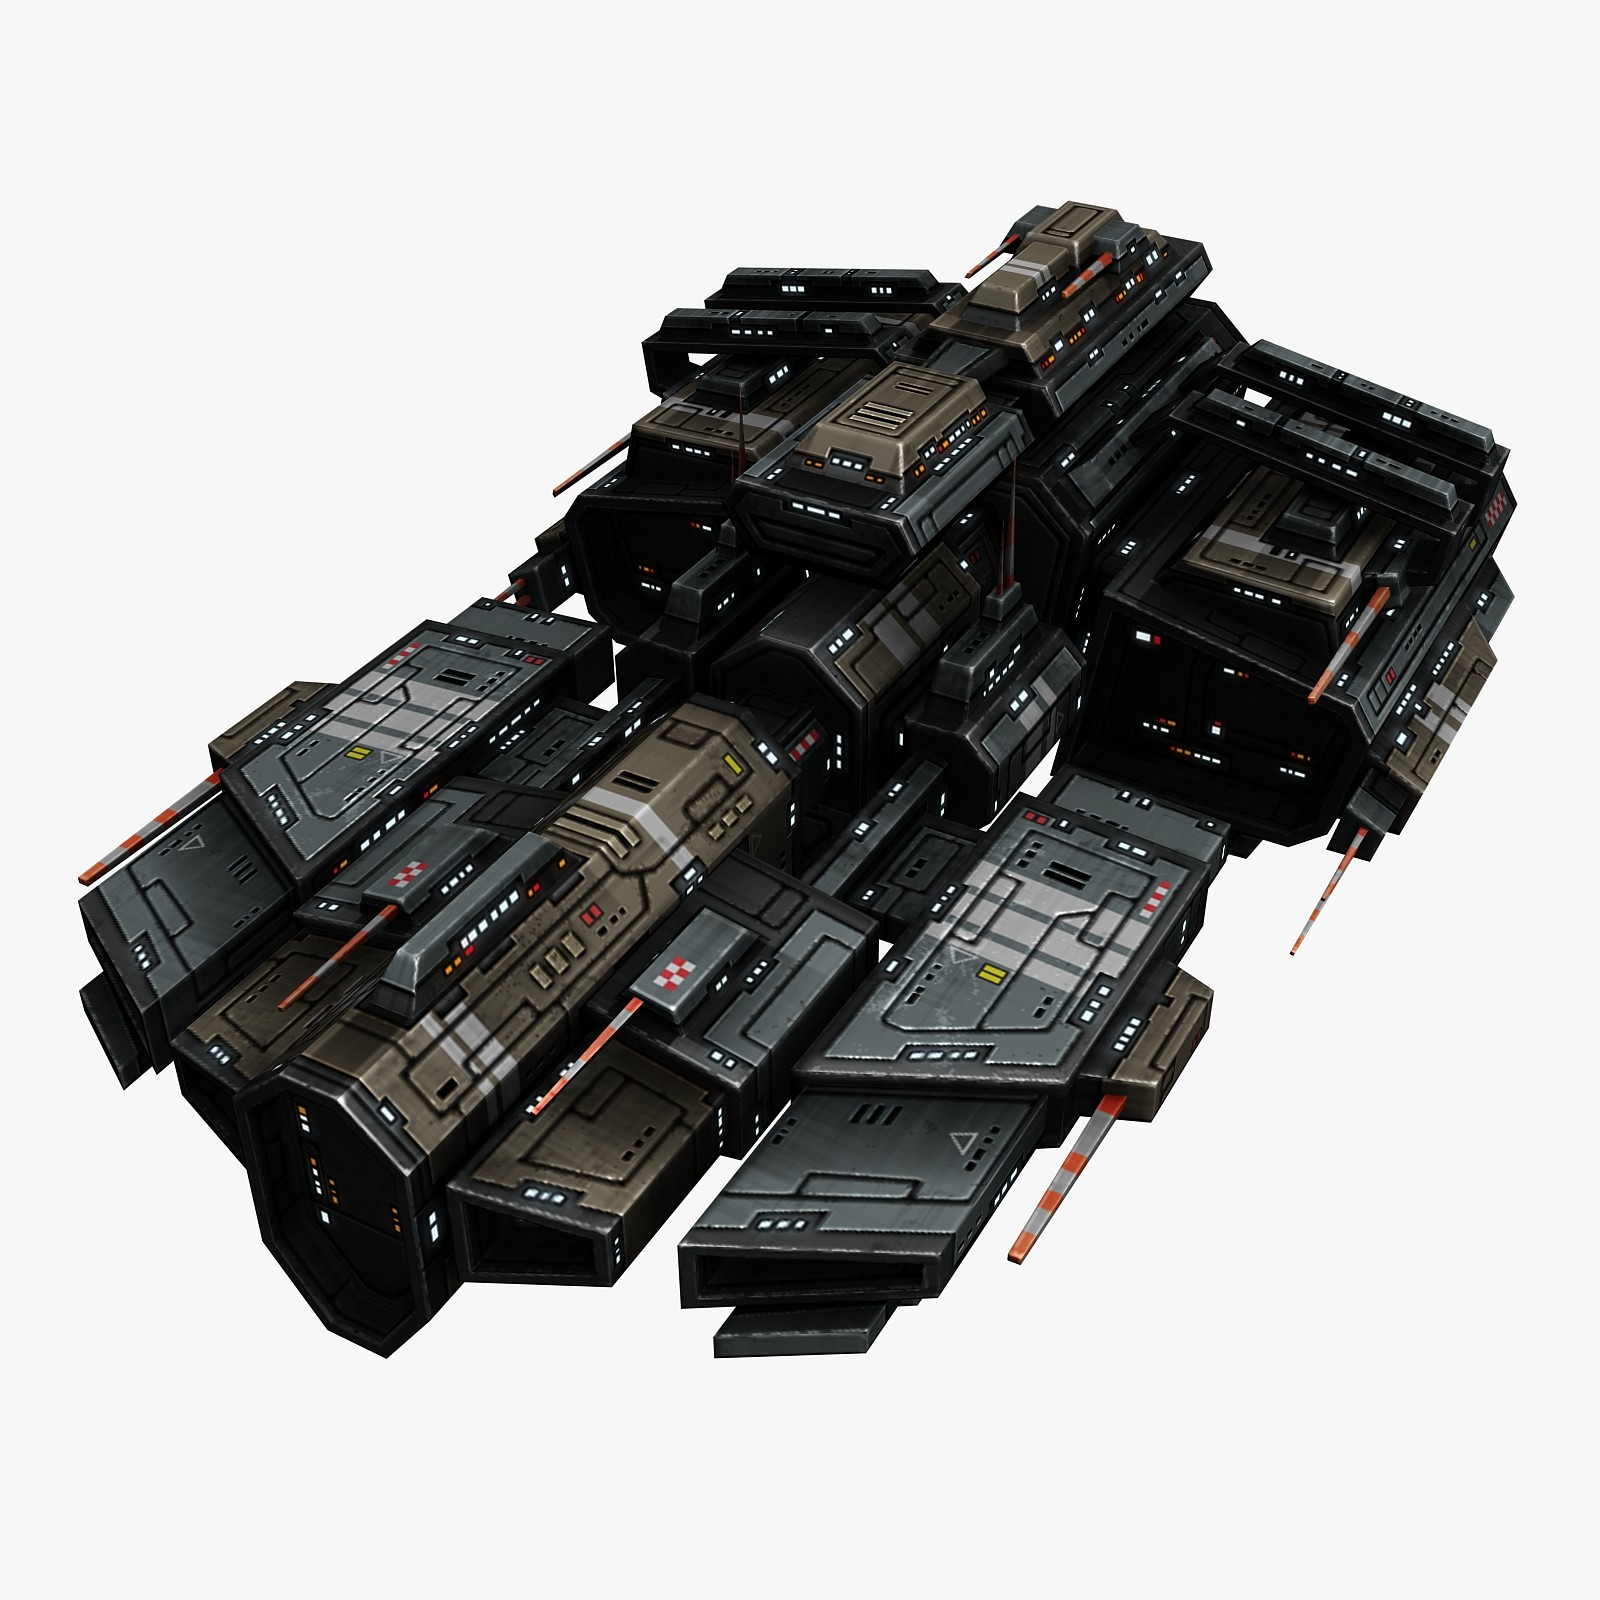 spaceship_frigate_3_preview_1.jpg